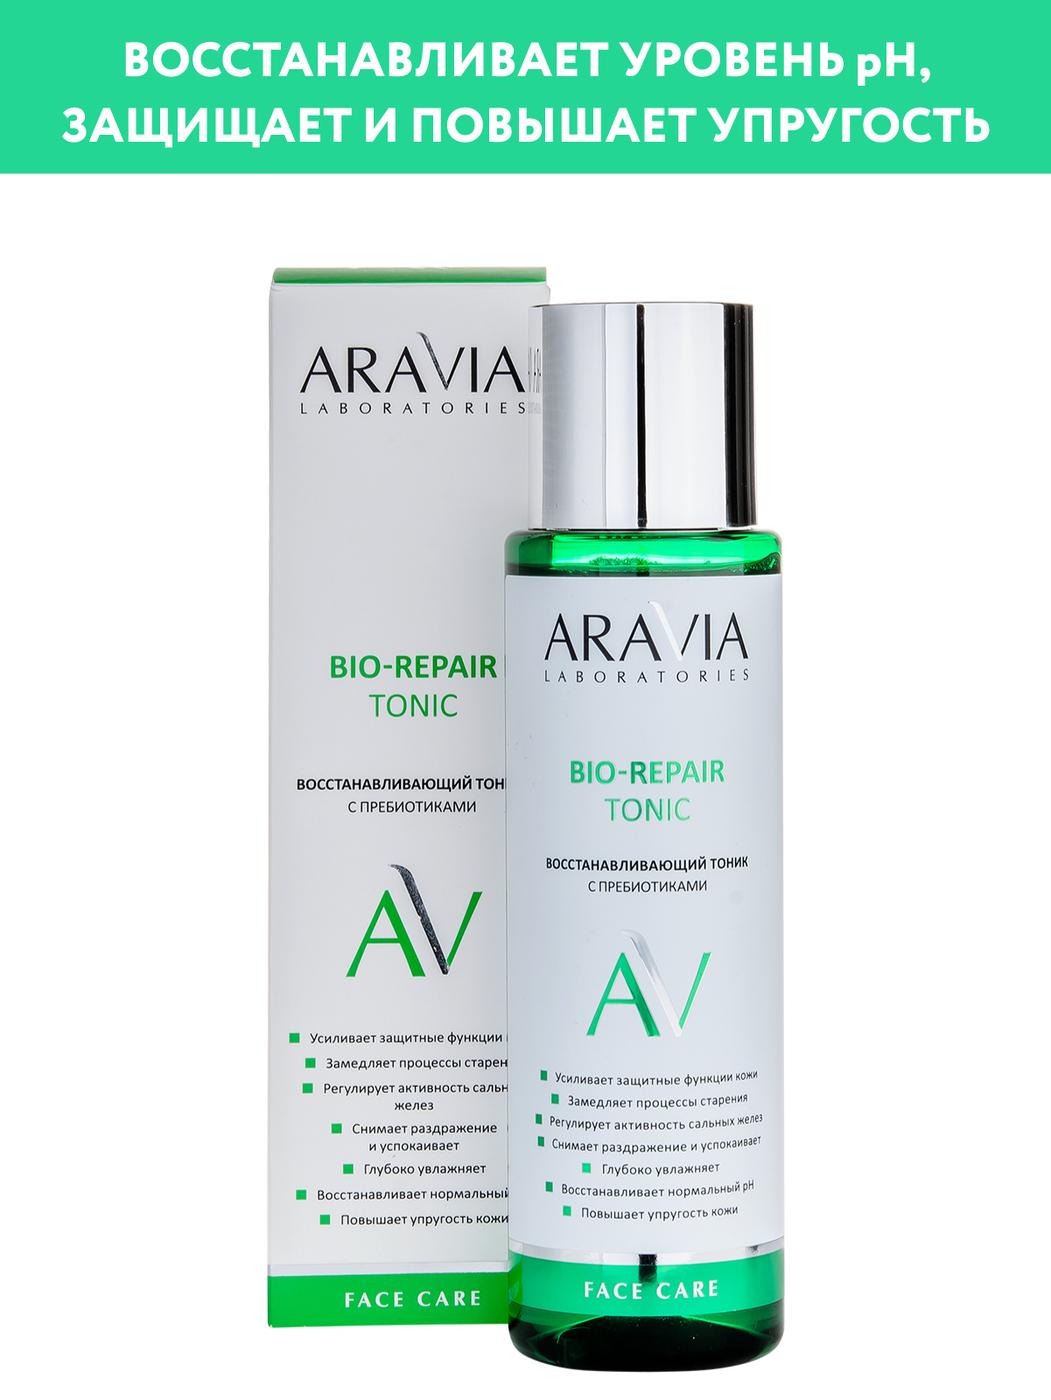 ARAVIA Laboratories Восстанавливающий тоник с пребиотиками Bio-Repair Tonic, 250 мл